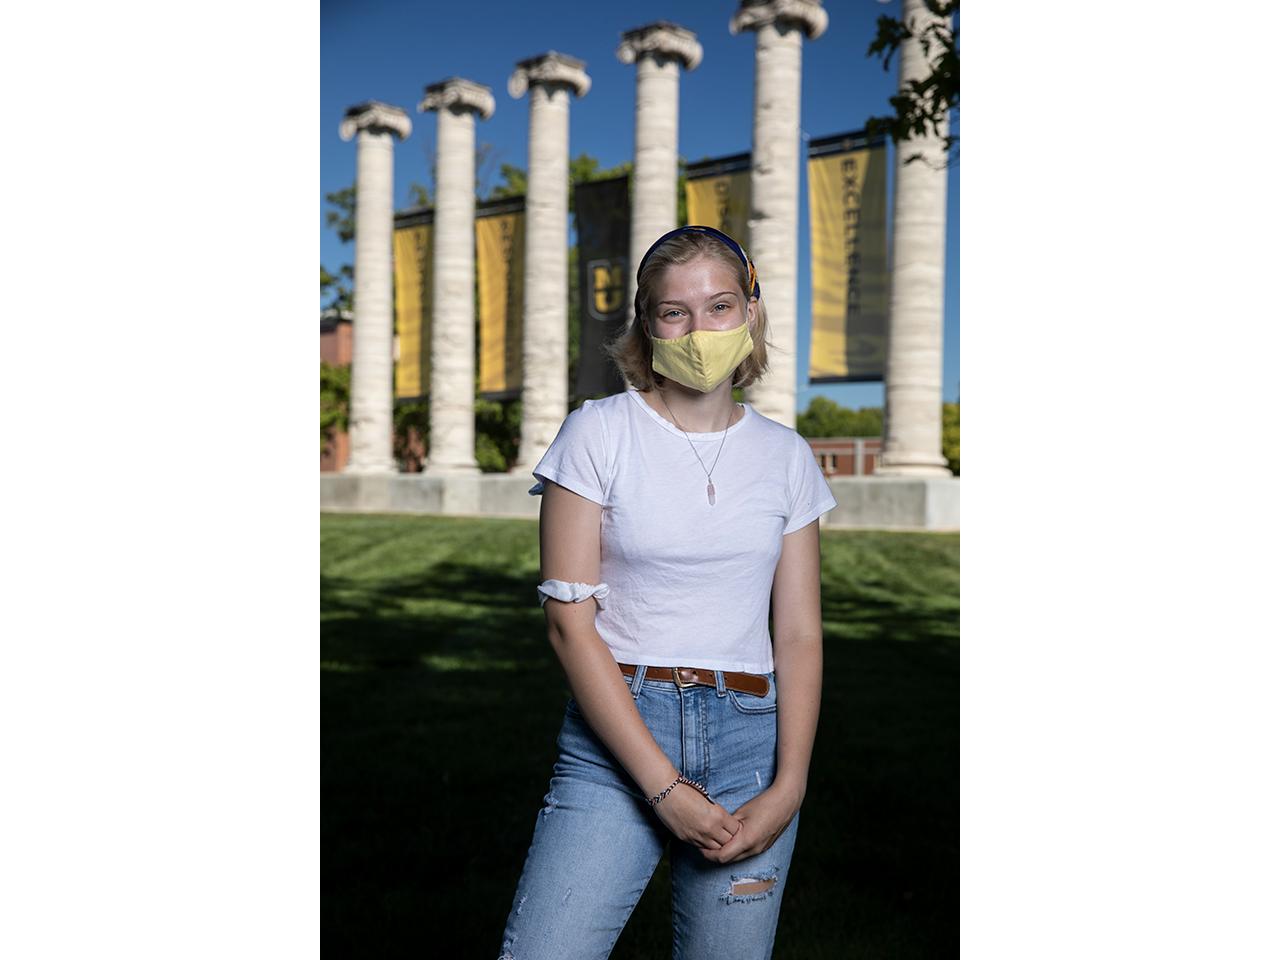 Rae Stecker, freshman journalism major